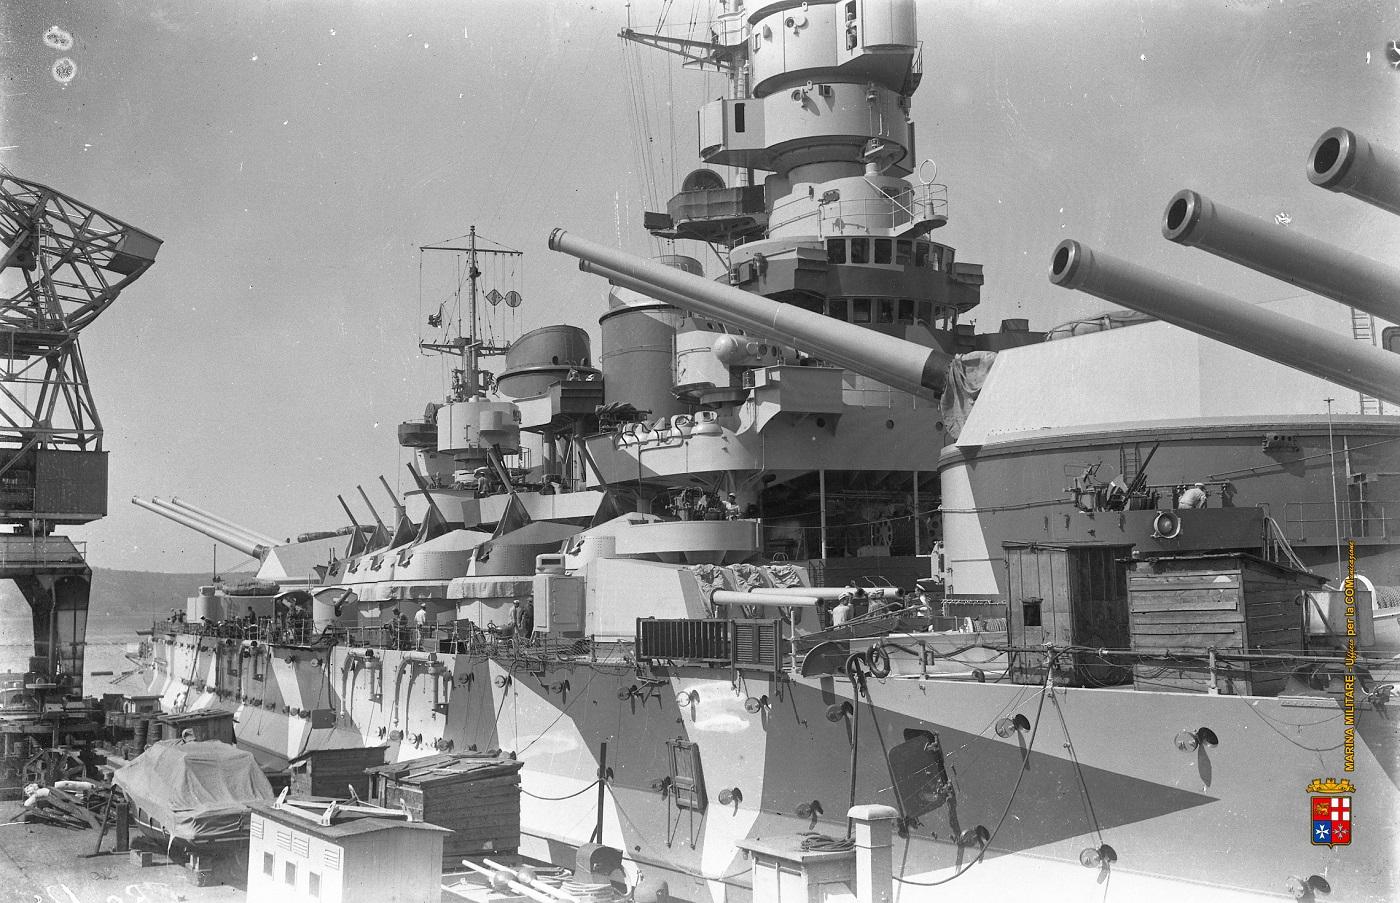 Wwii italy navy battleship roma 1943 plastic model images list - Wwii Italy Navy Battleship Roma 1943 Plastic Model Images List 37